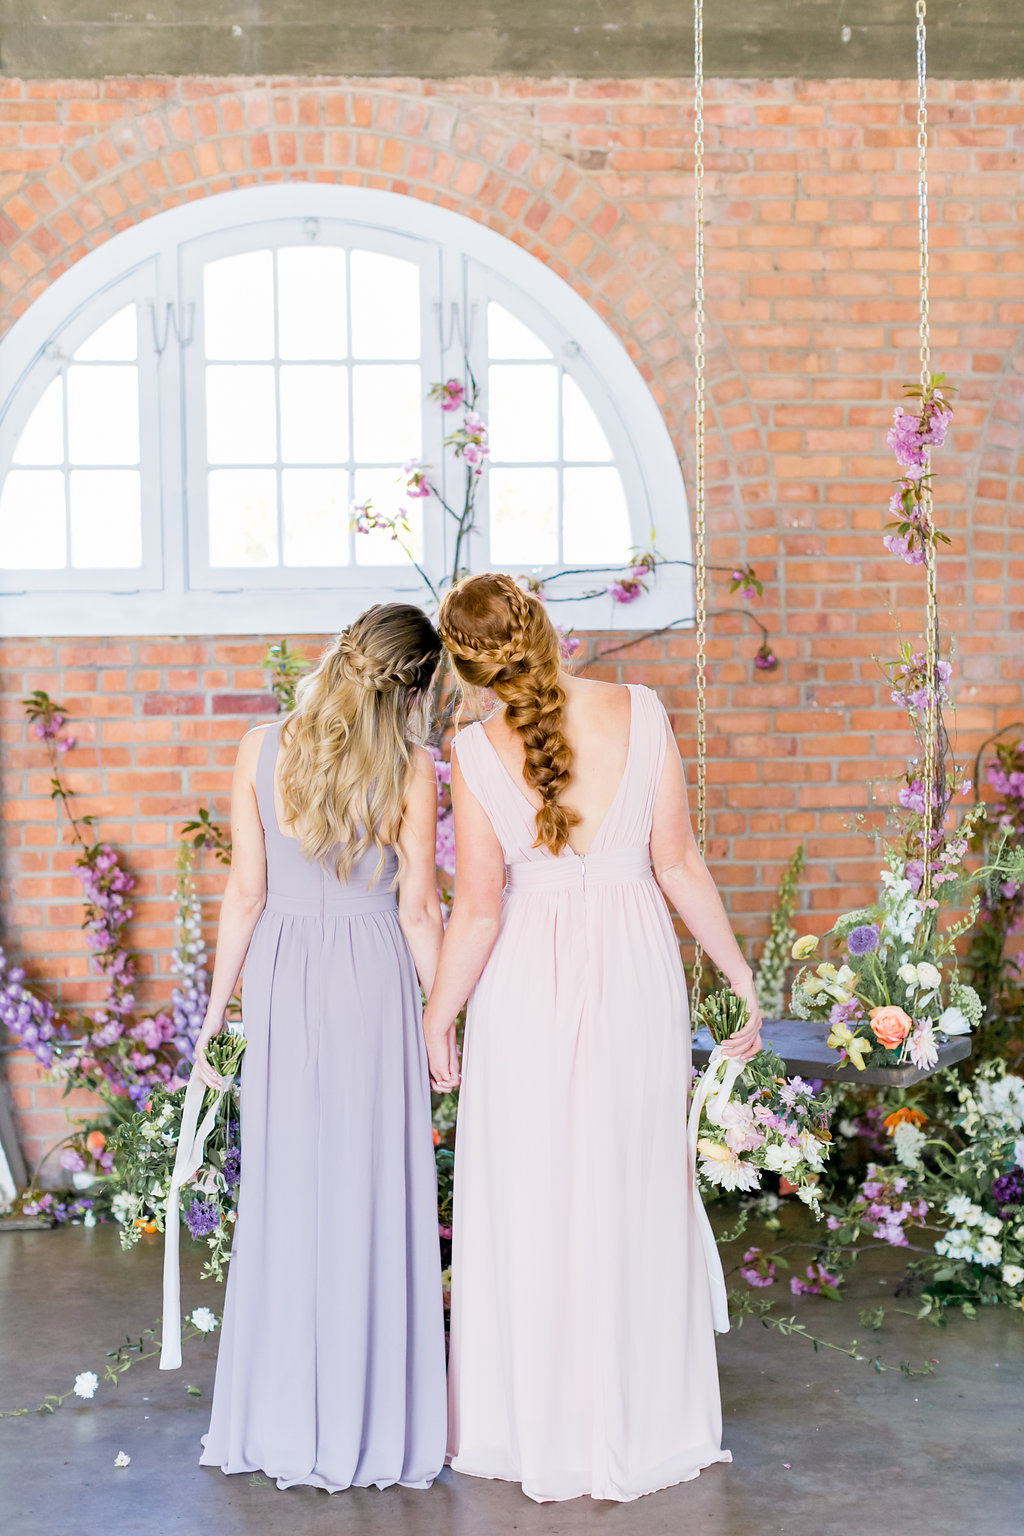 FloralBrickWeddingEditorial-NatalieSchuttPhotography-147.JPG